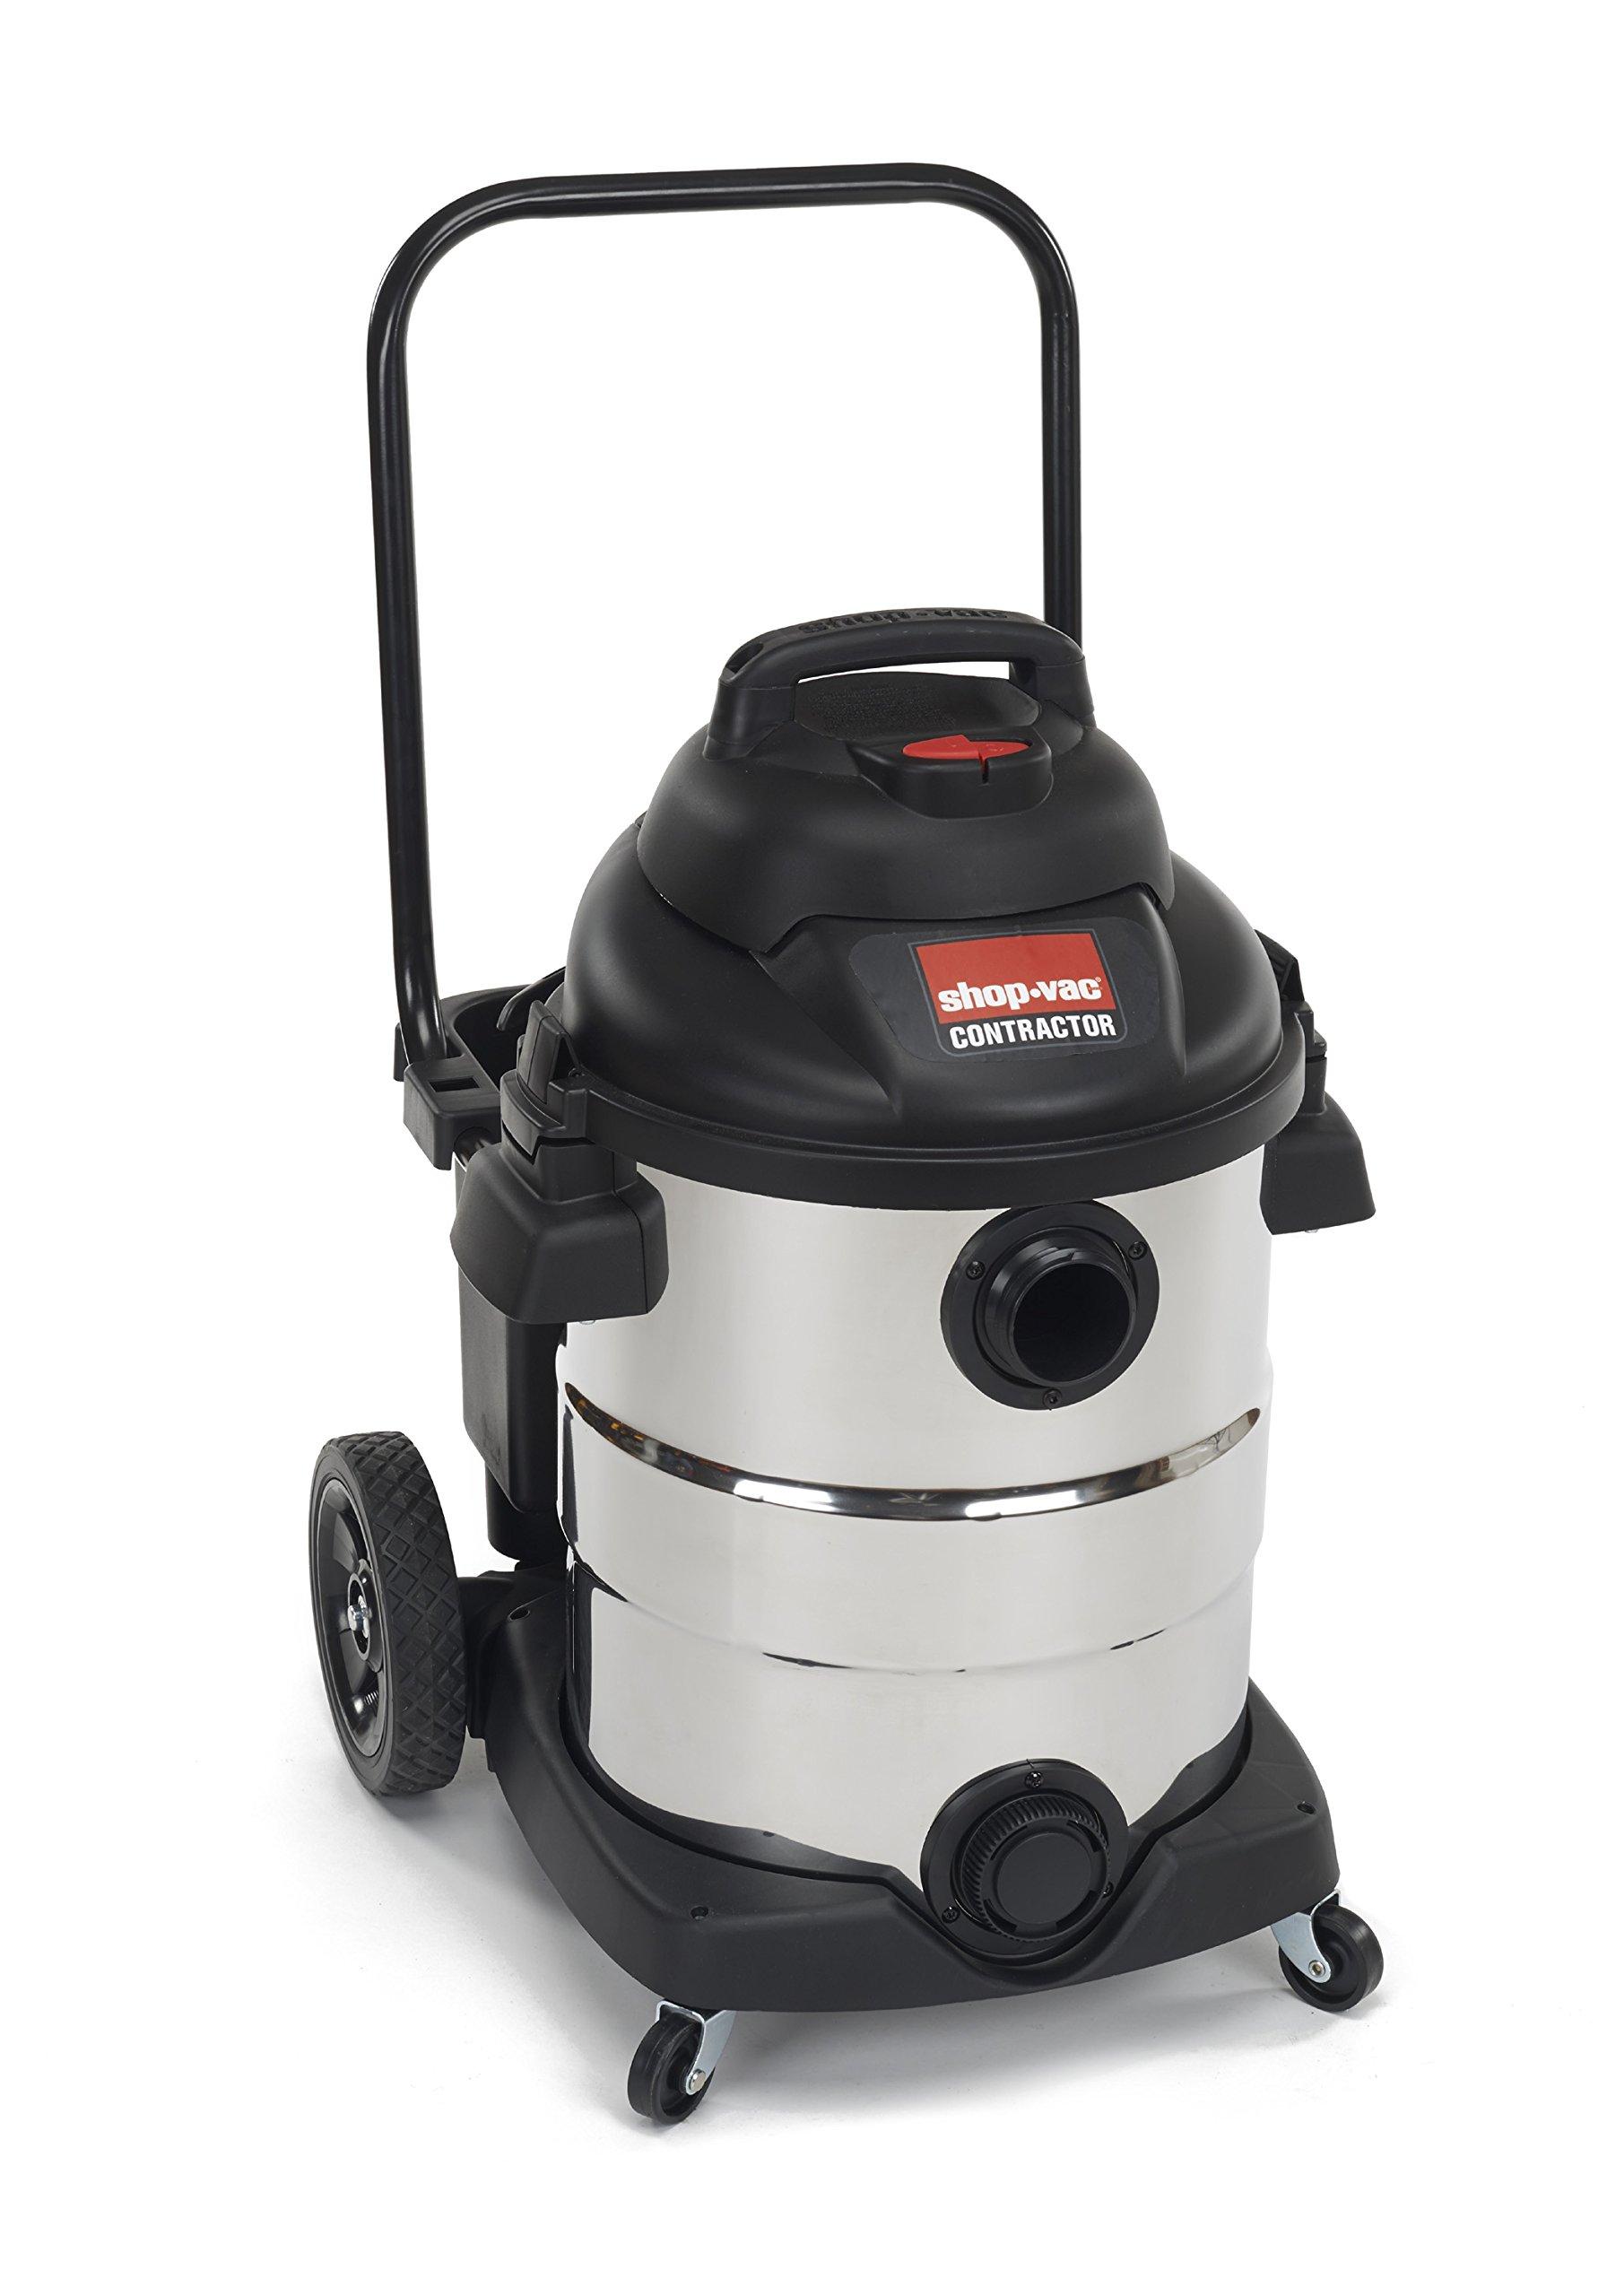 Shop-Vac 9626510 6.5 Peak HP Stainless Steel Wet Dry Vacuum, 10-Gallon by Shop-Vac